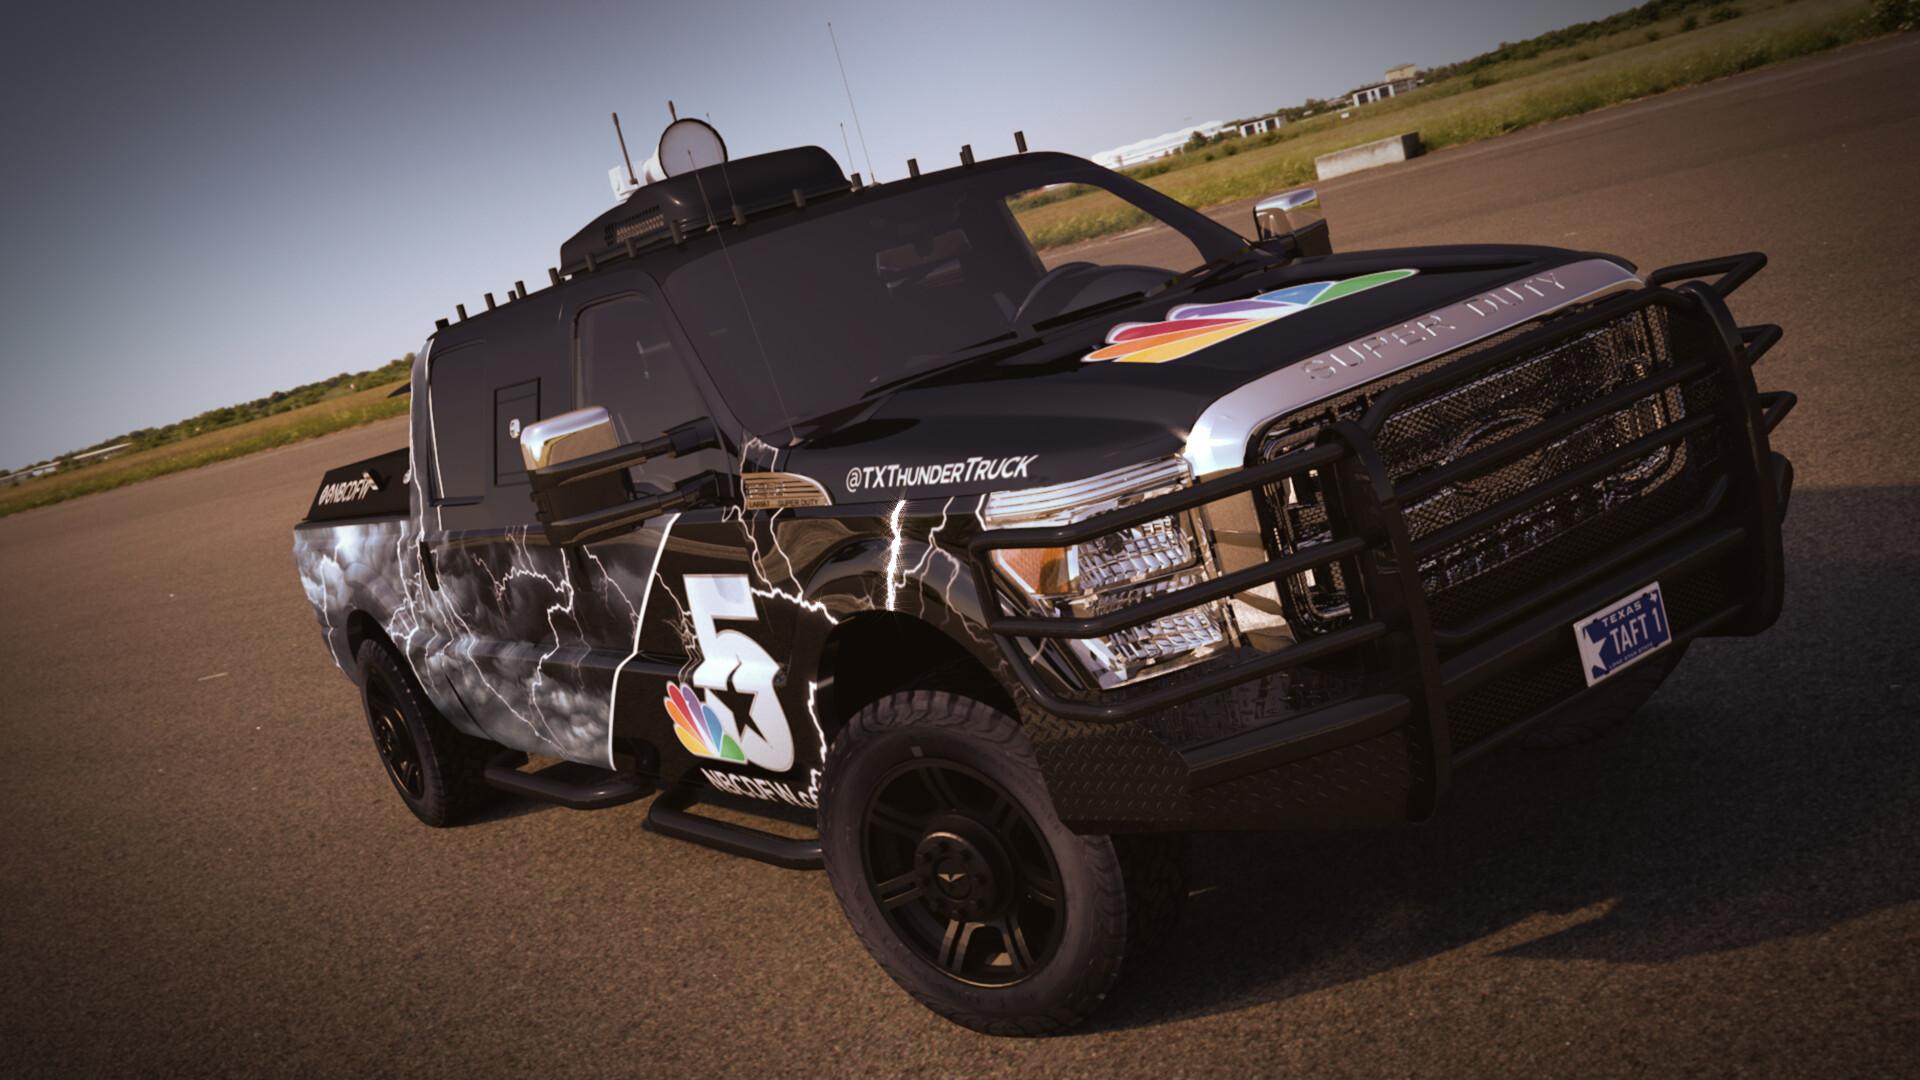 NBC 5 Fleet Vehicles